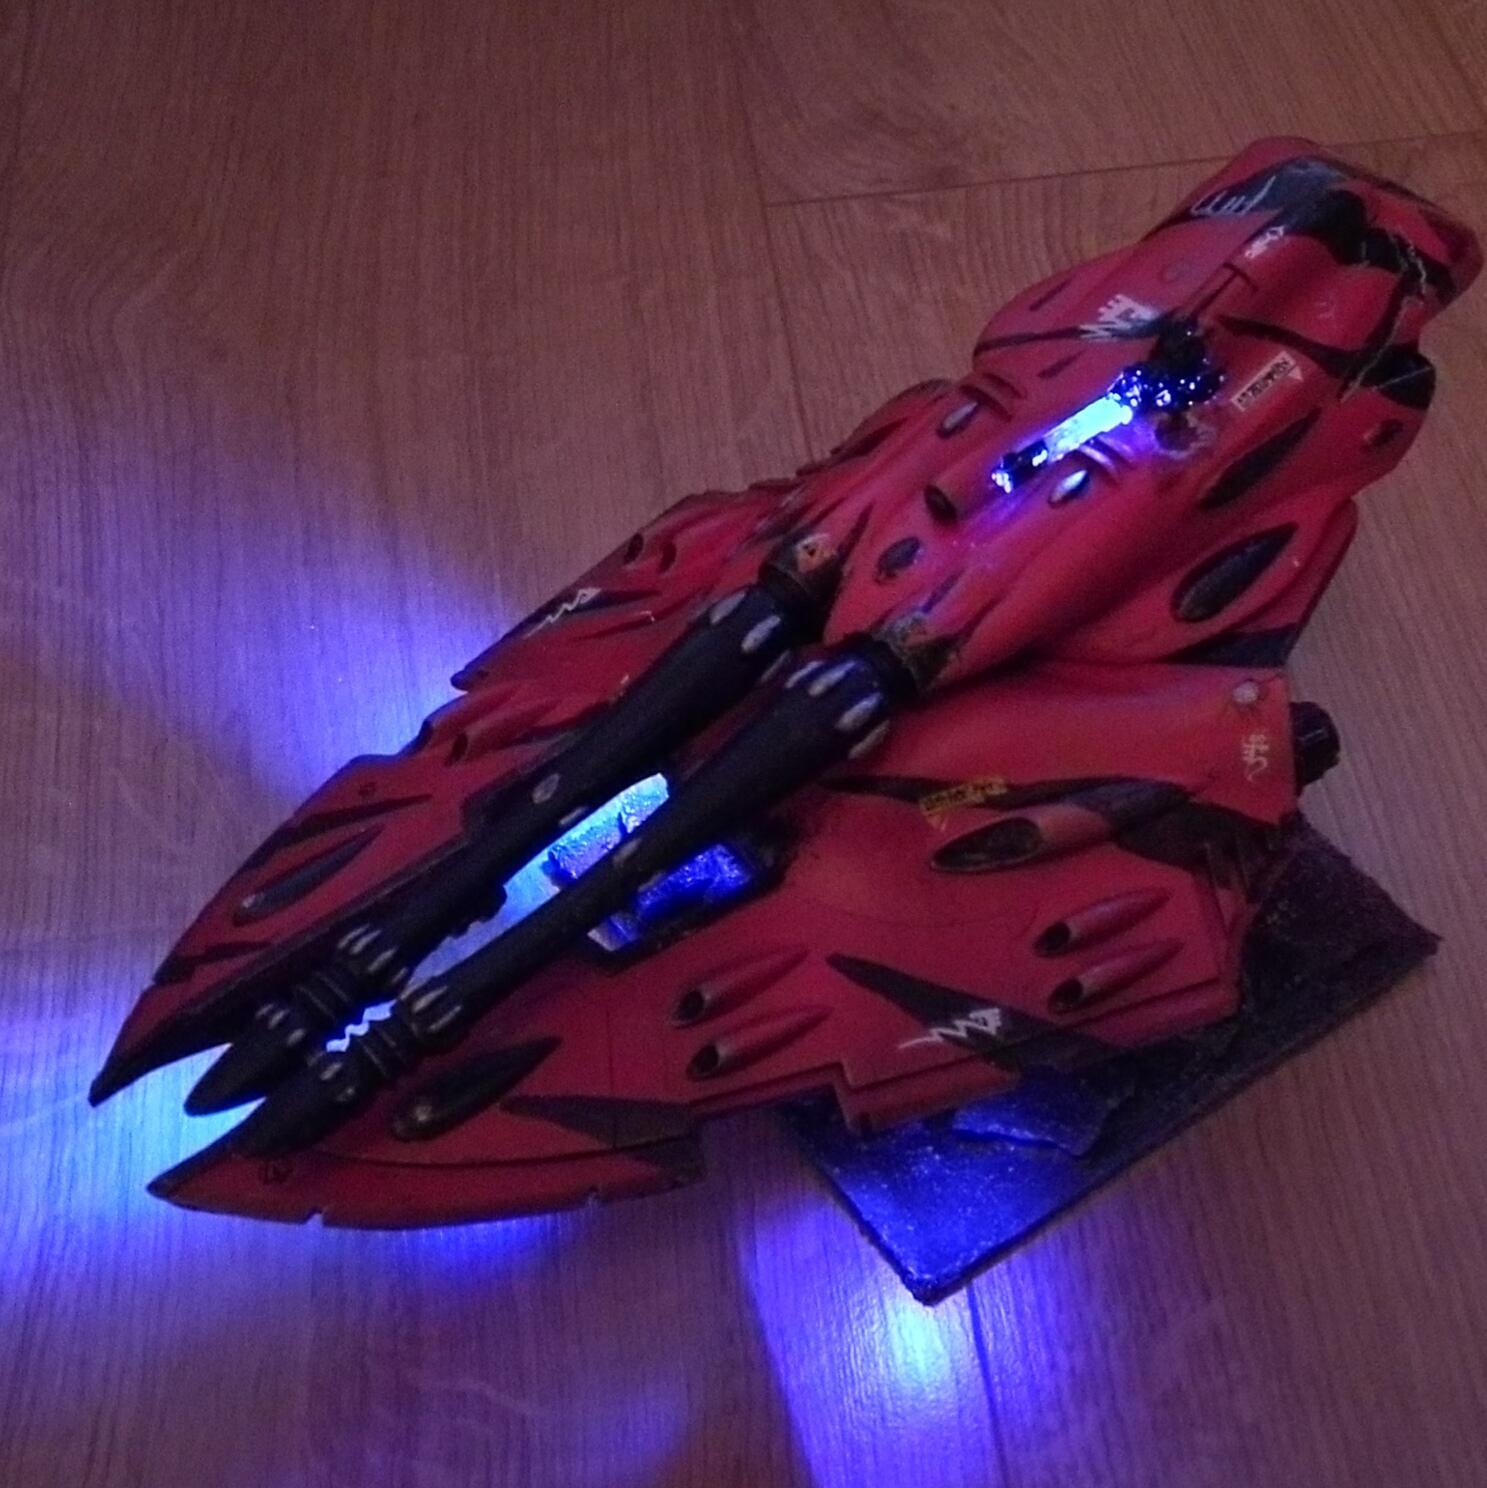 Eldar, Forge World, LED, Light, Lit, Scorpion, Tank